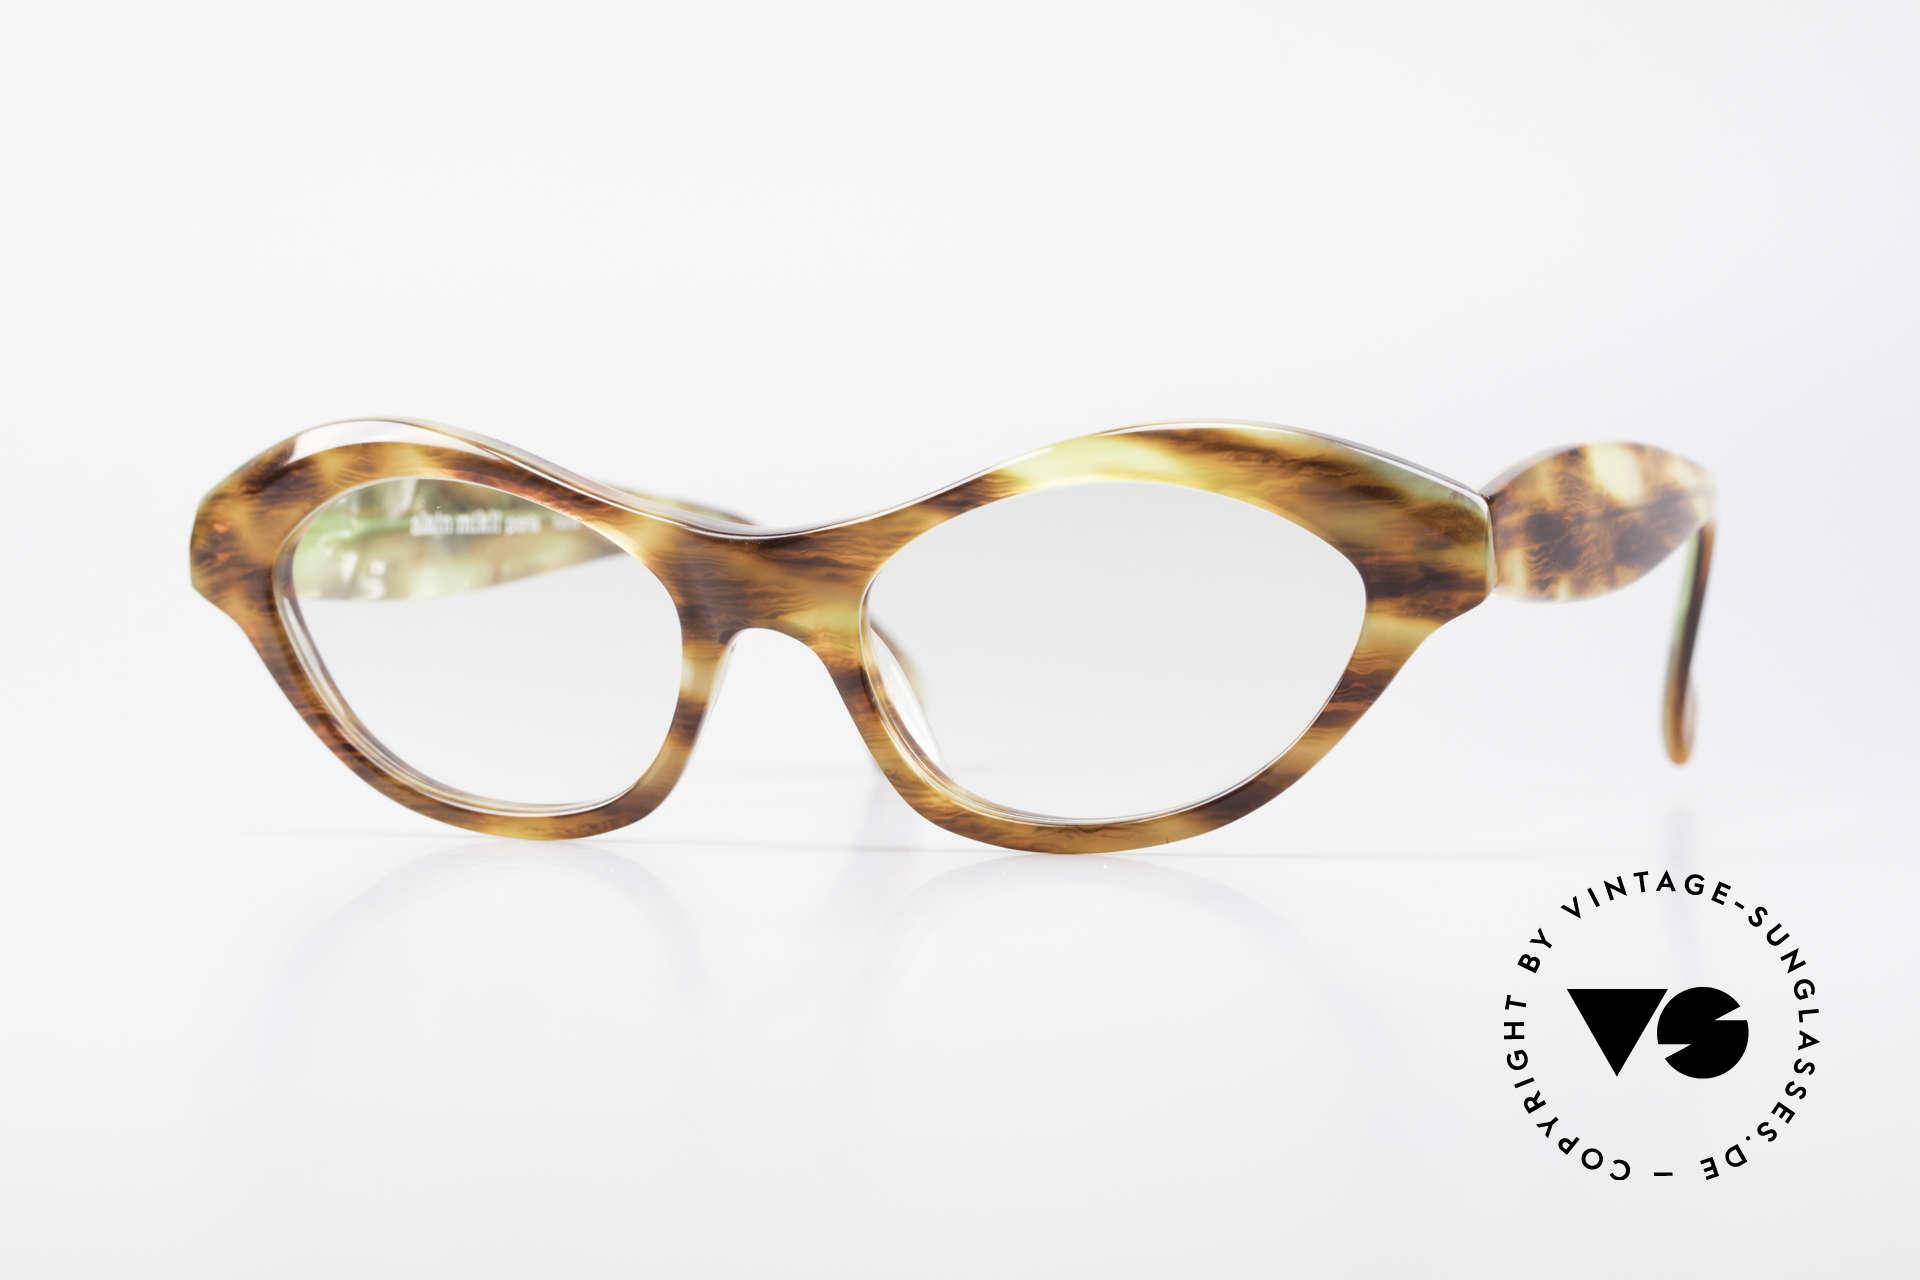 Alain Mikli 2112 / 1036 80's Cateye Designer Shades, enchanting designer sunglasses by Alain Mikli, Made for Women